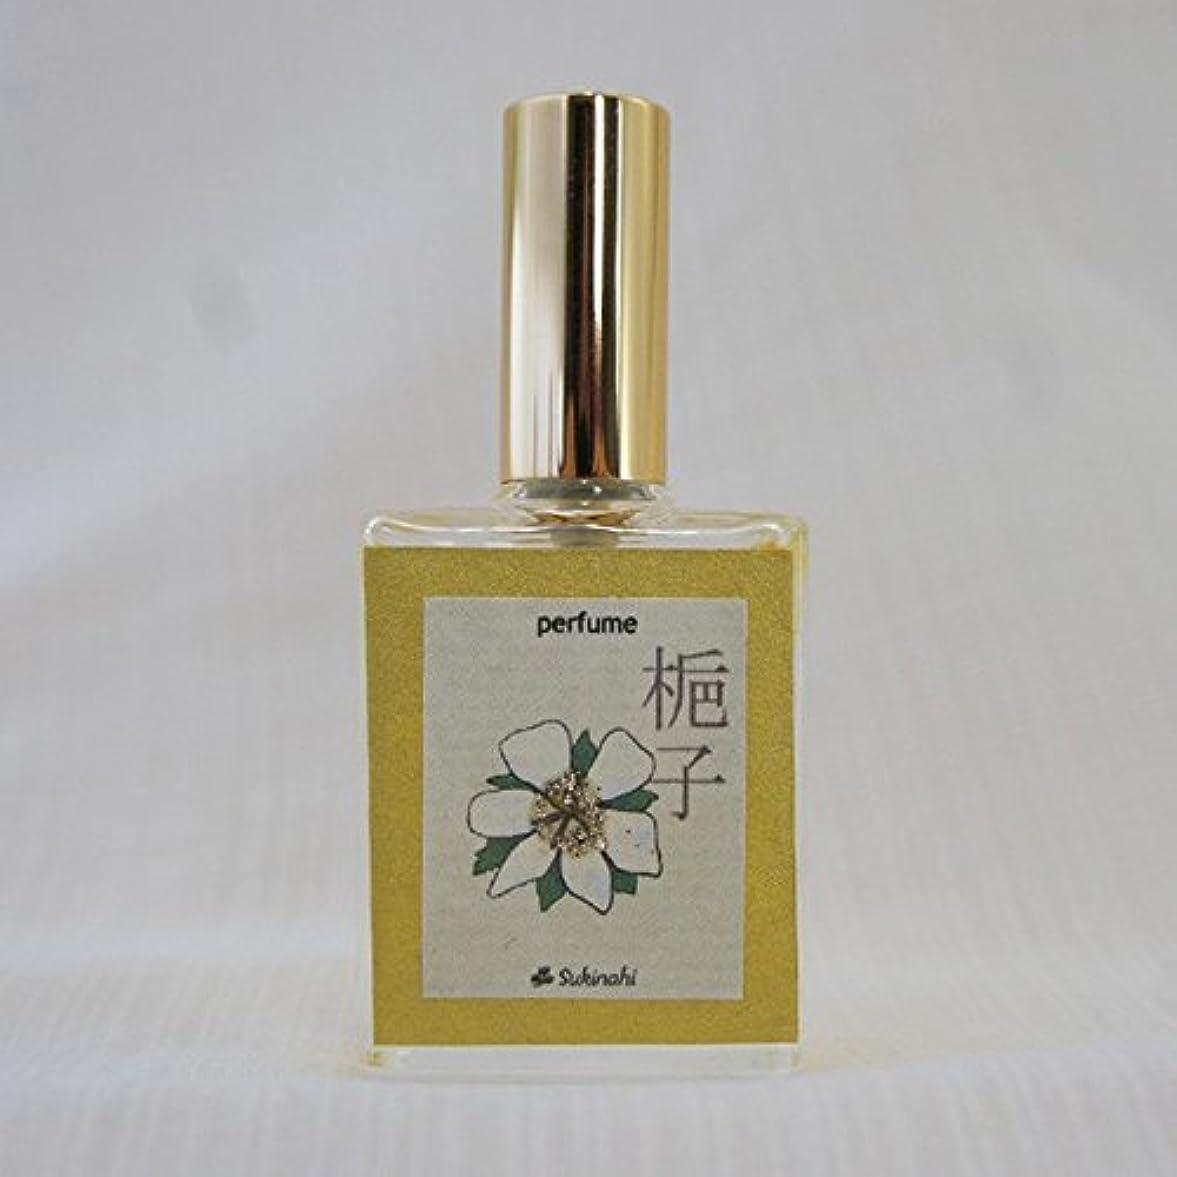 乱気流首謀者飛び込む和香水「三大香木シリーズ」16ml (梔子)